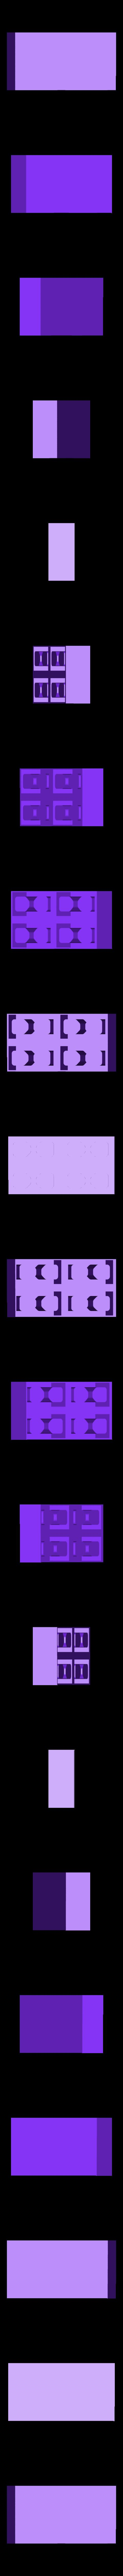 Molde_4_tijolos.stl Download free STL file 4 Miniature cinder block mold • 3D printing model, 3Delivery